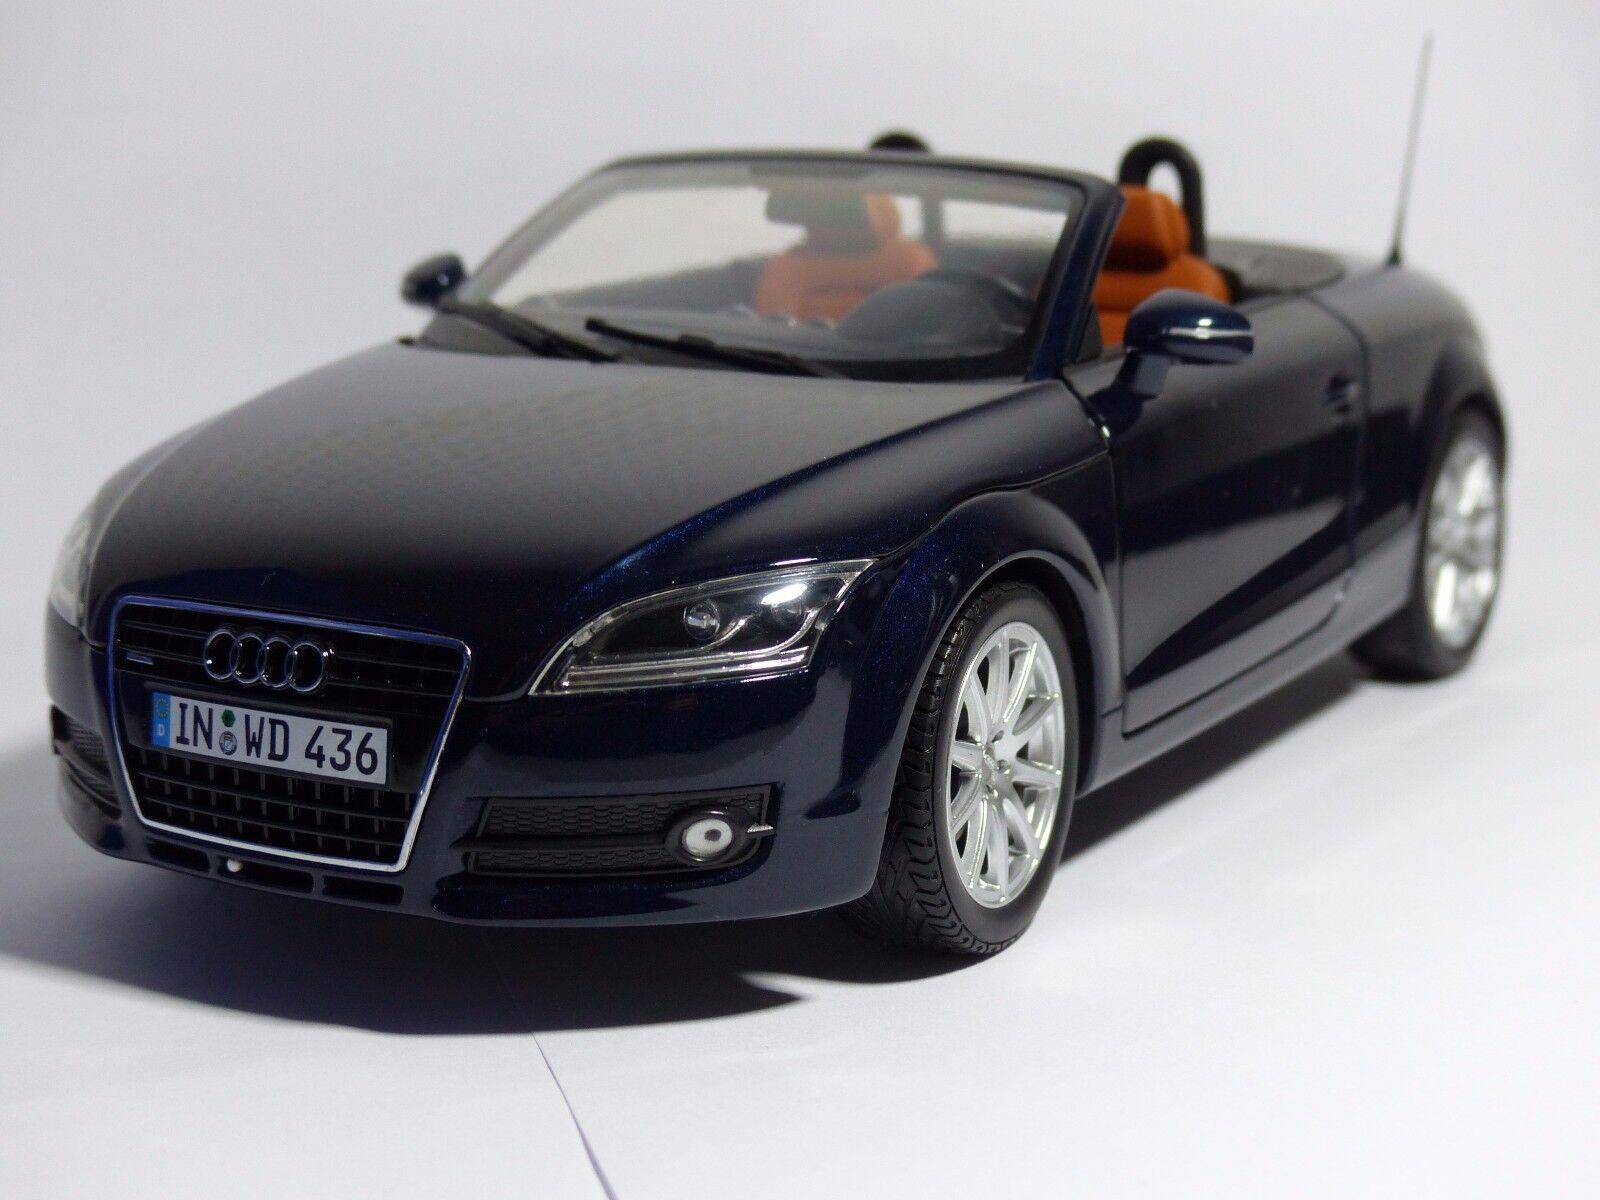 Audi TT Roadster  Deep Sea bleu bleu Minichamps 1 18 nouveau OVP Audi Dealer 5010500525  meilleure vente